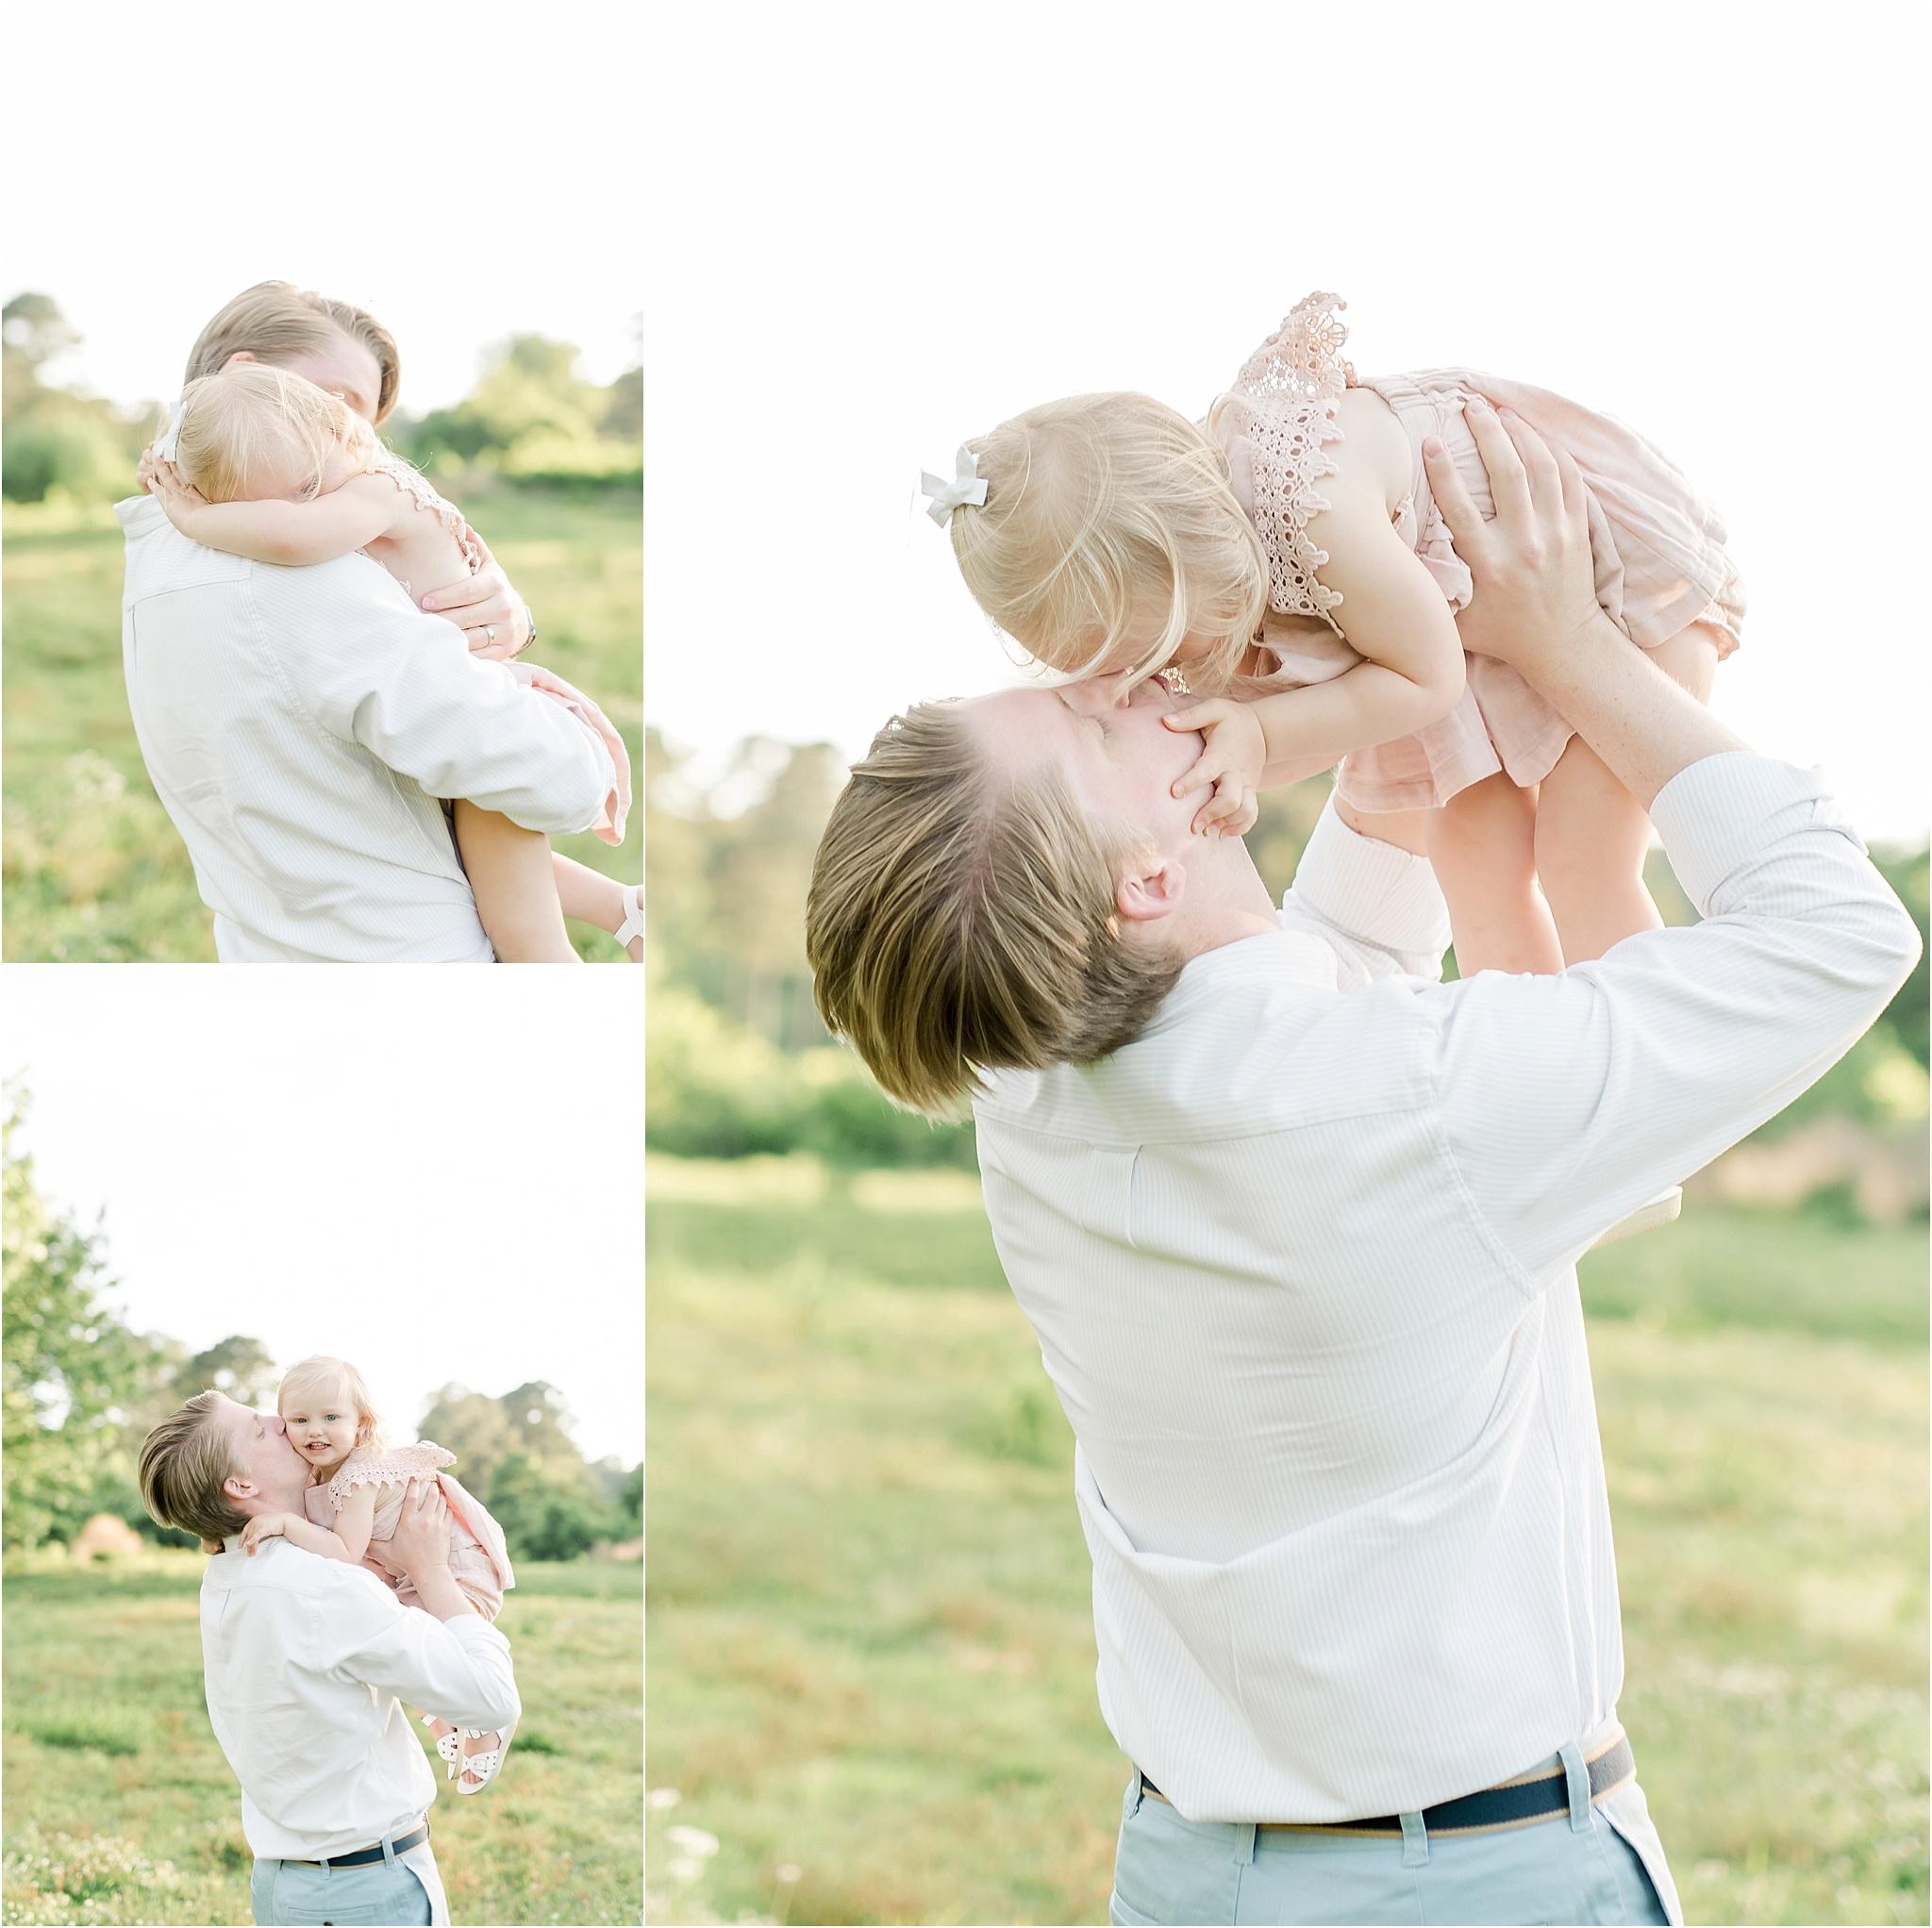 Rachel_Bond_Birmingham_AL-family-photography_0011.jpg